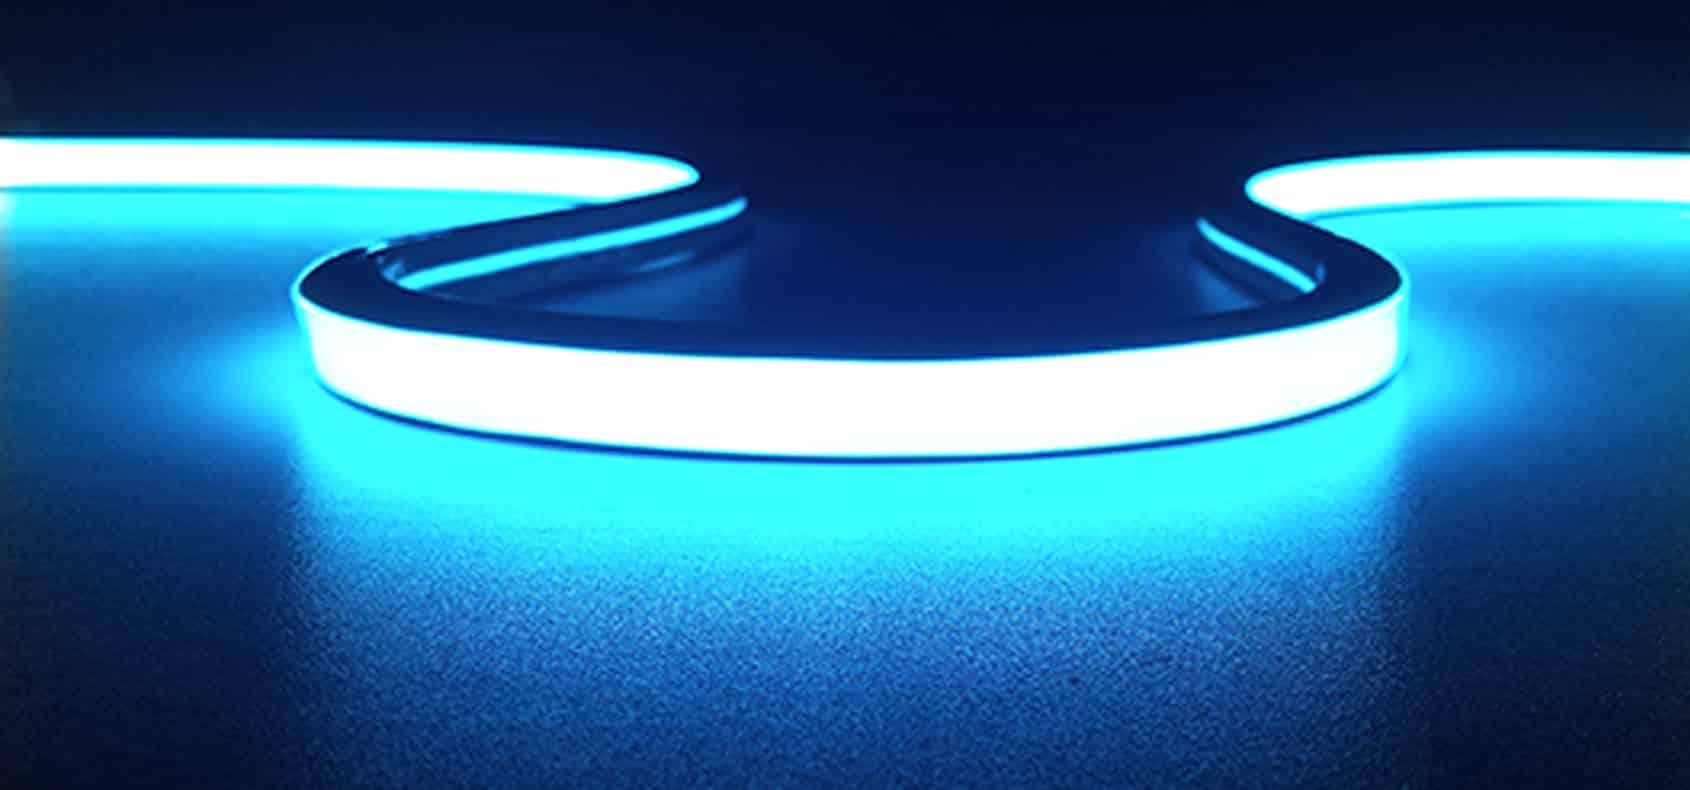 Neon-Flex-Slim Top Bend - 9.4x10mm - Tunable & RGB - Img